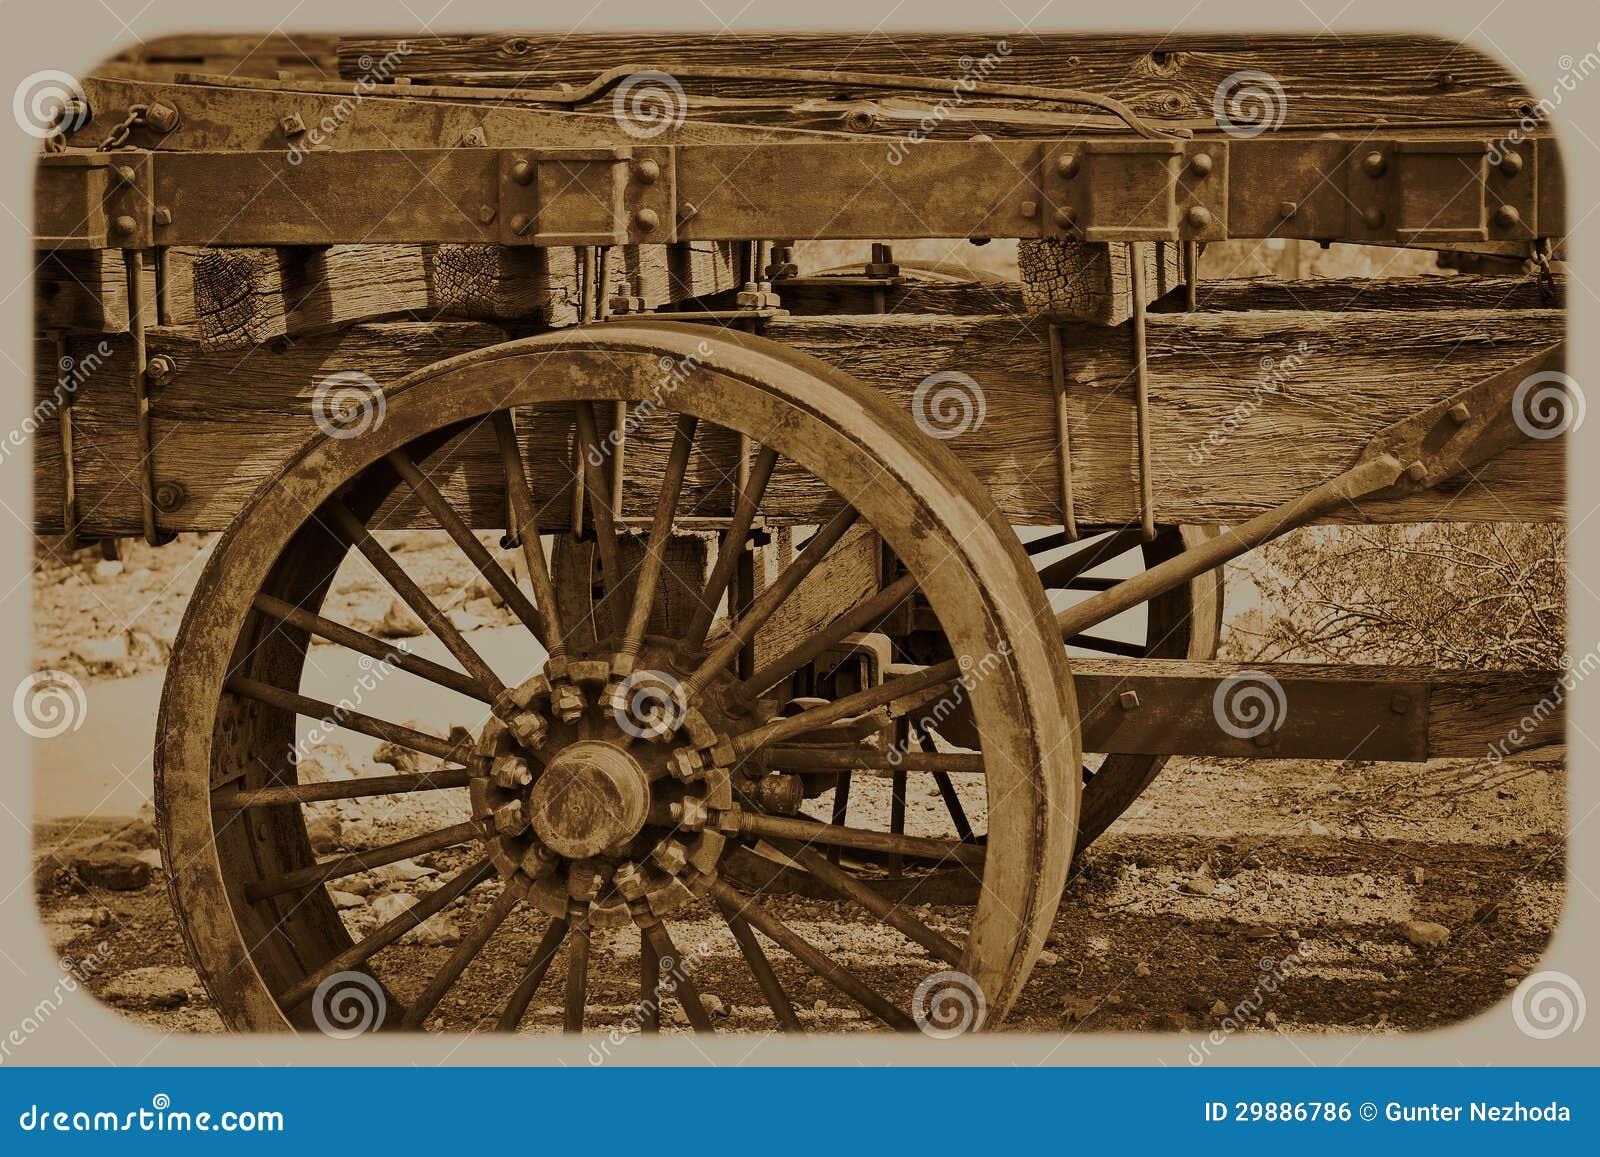 Western Wagon Wheel Royalty Free Stock Image - Image: 29886786